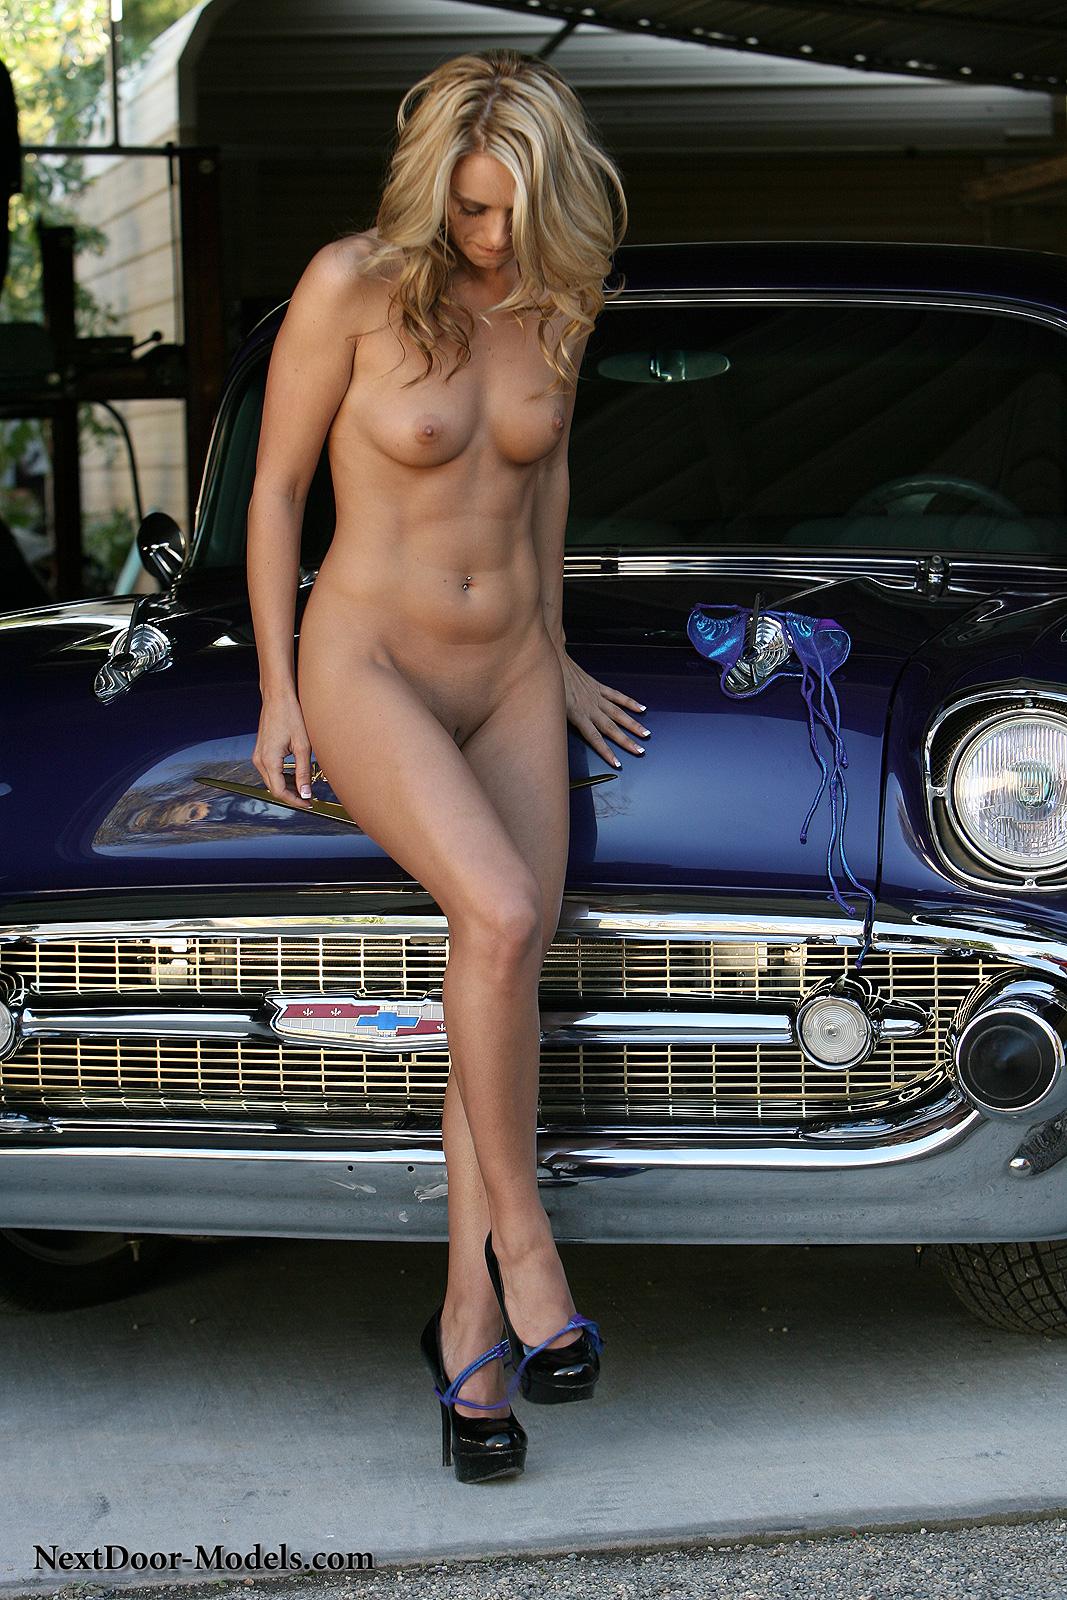 Naked Women Driving Nude Car Girls